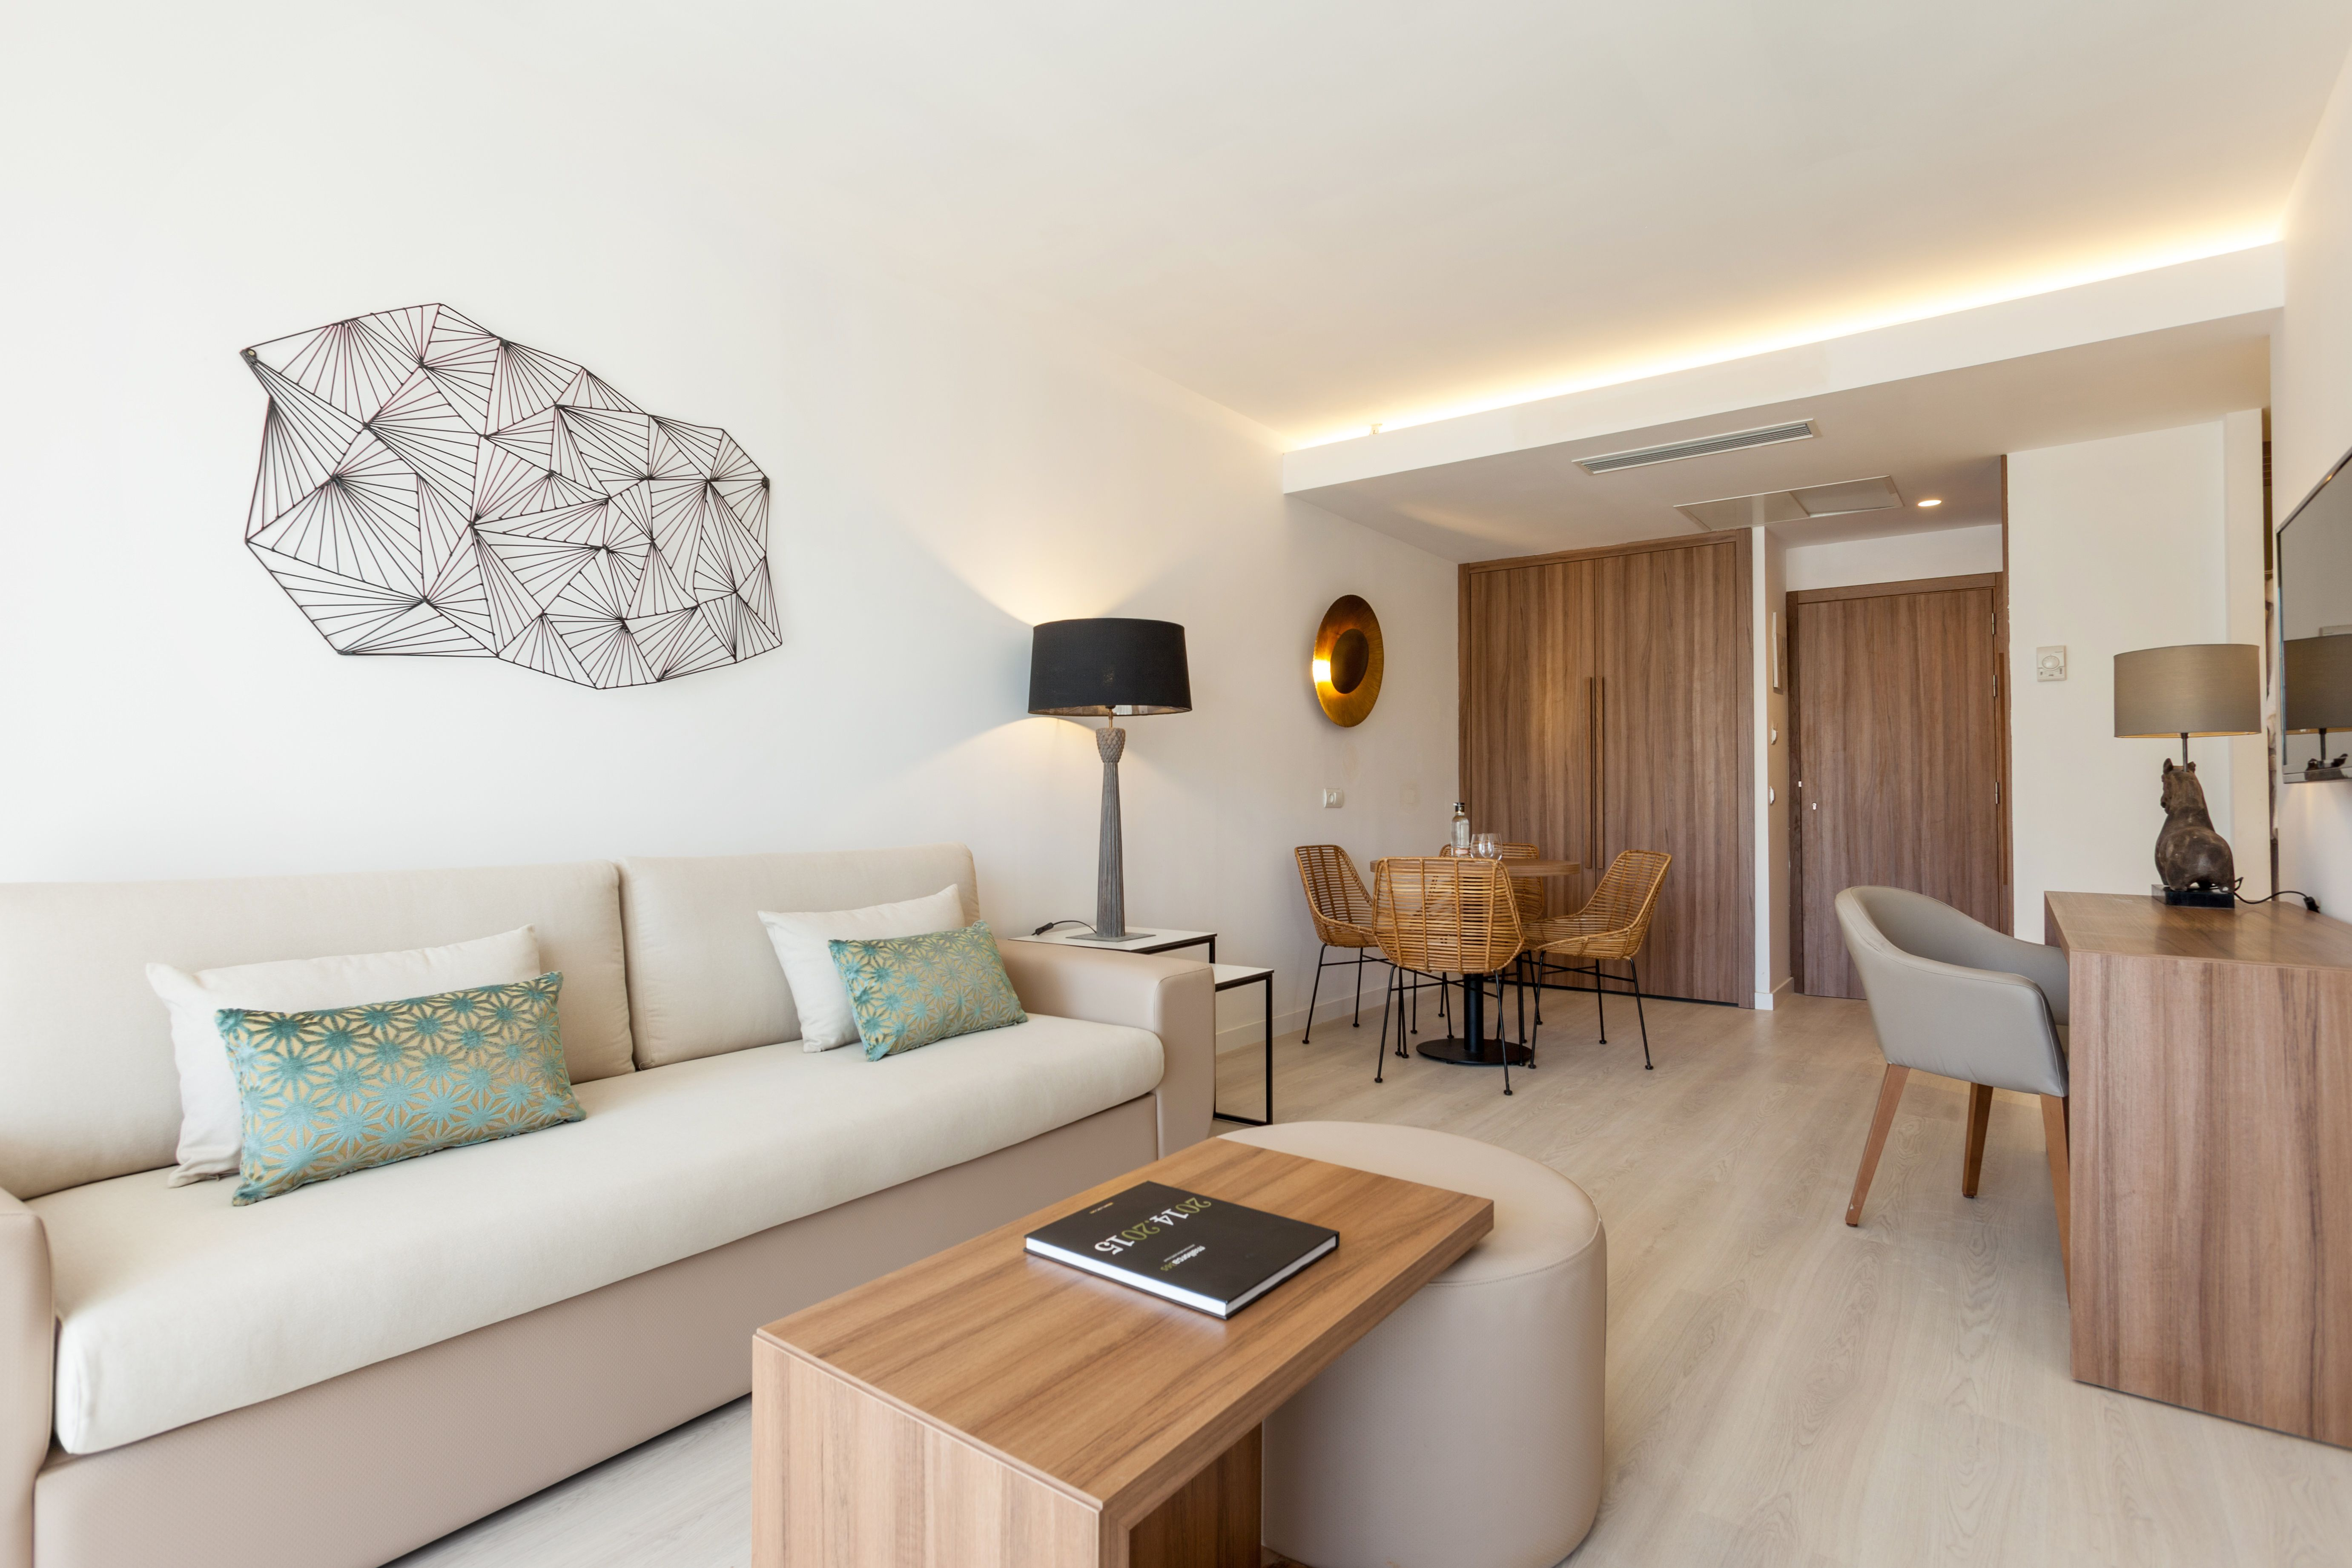 Zafiro Swim Up Suite Zafiro Palace Alcudia Pinterest Palace ~ Muebles Rey Espacio Mediterraneo